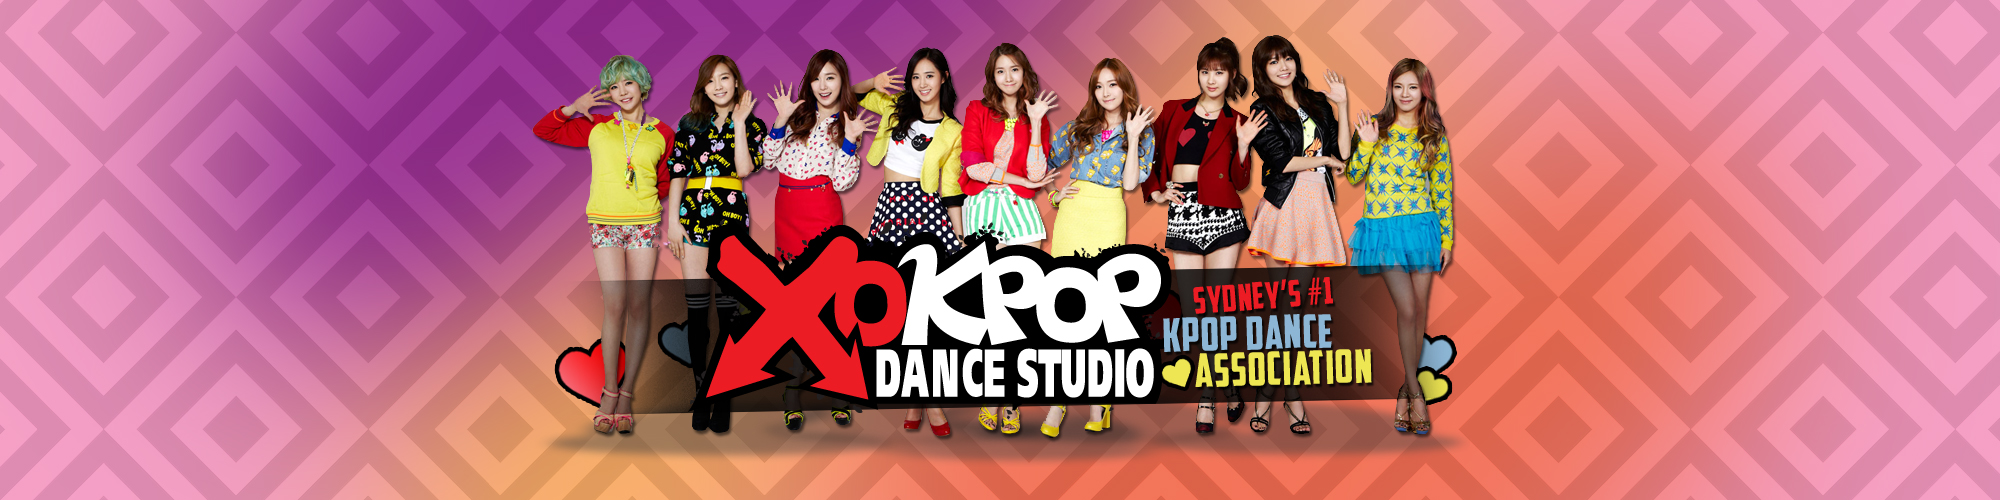 Kpop dance classes in sydney crossover dance studio xoheaderkpop baditri Images